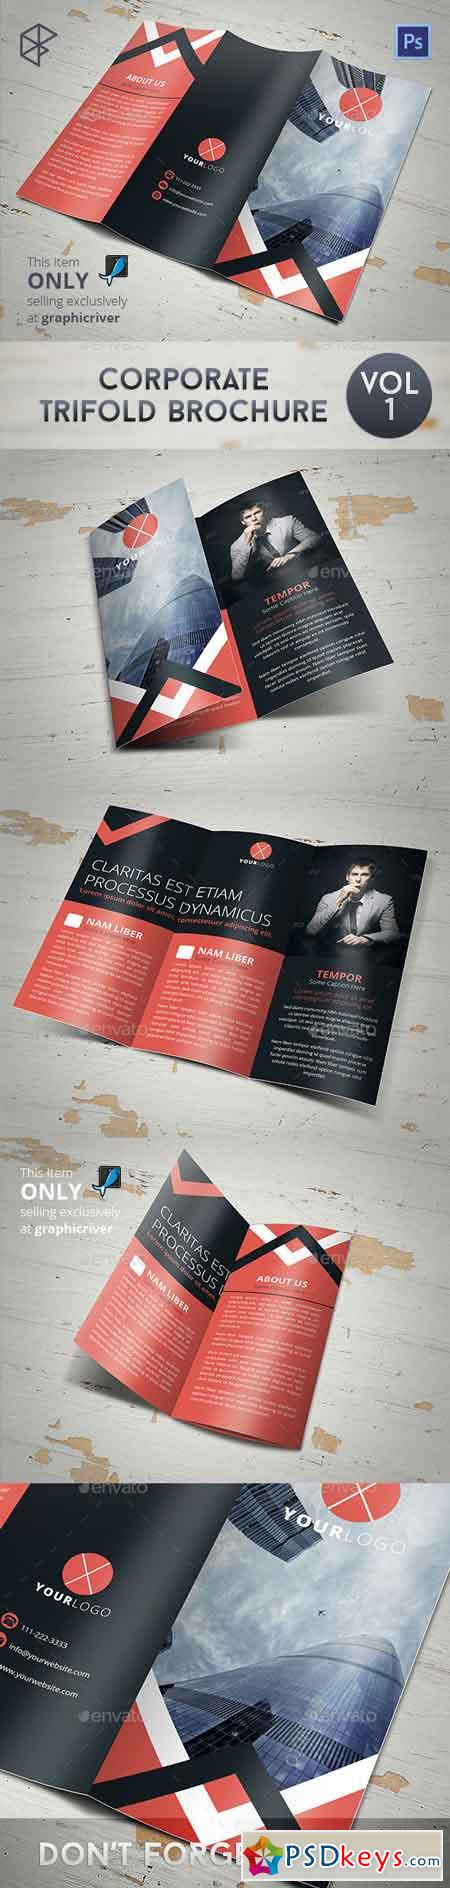 Corporate Trifold Brochure 7829117